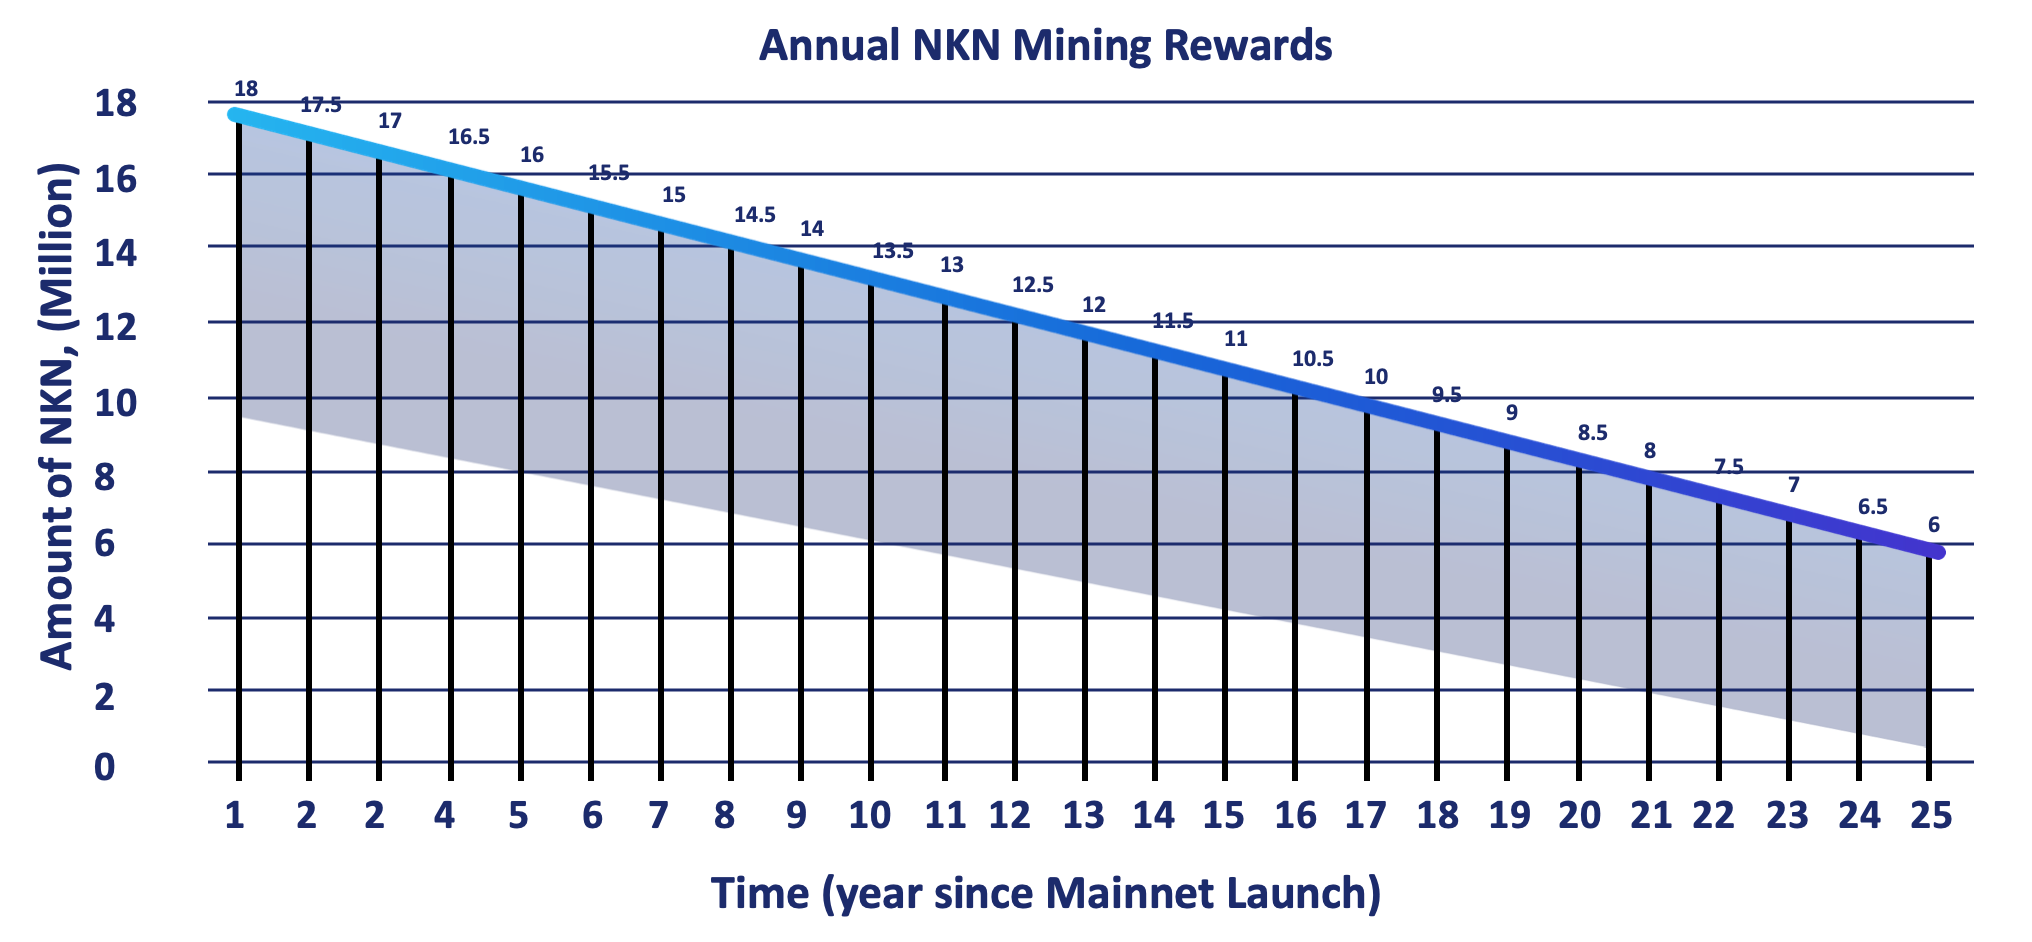 NKN Mining reward over years chart